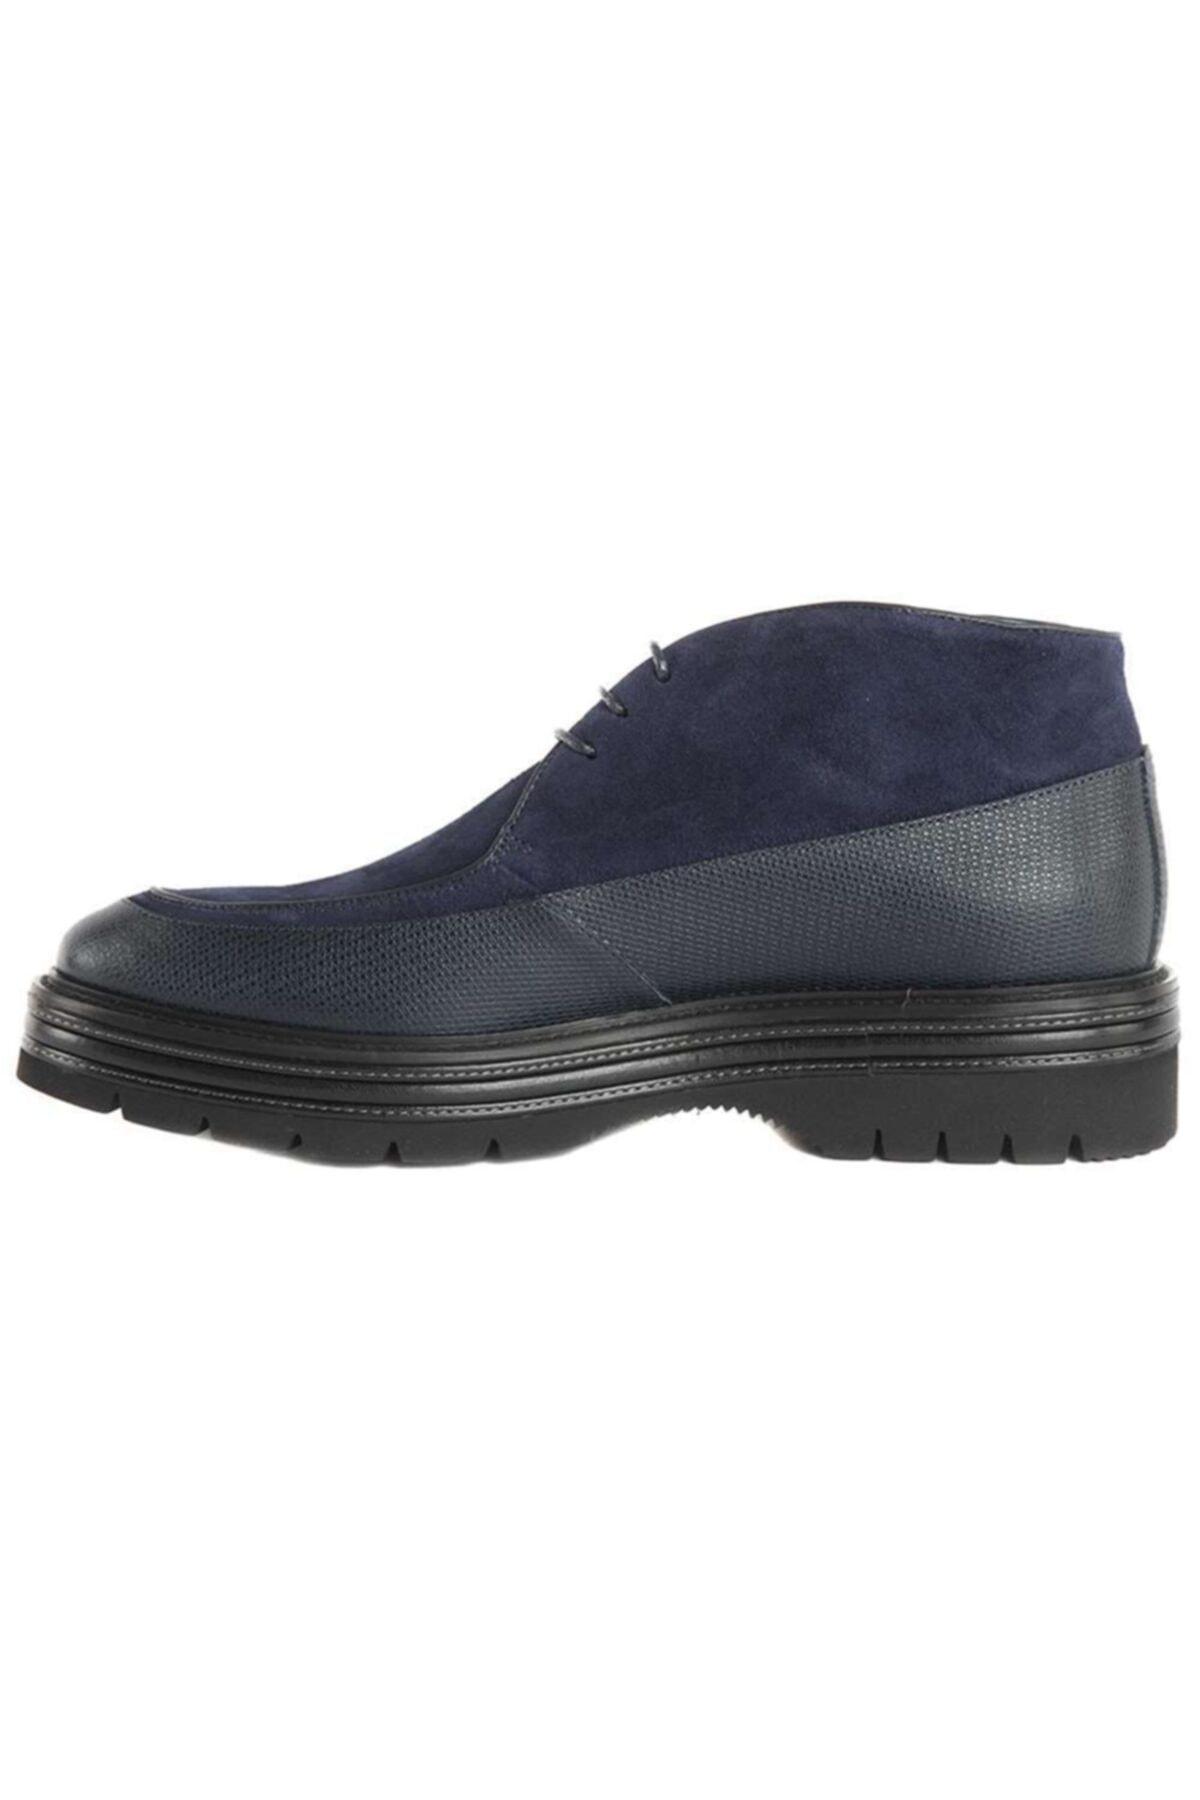 ALBERTO GUARDIANI Man Shoes Aldon 2